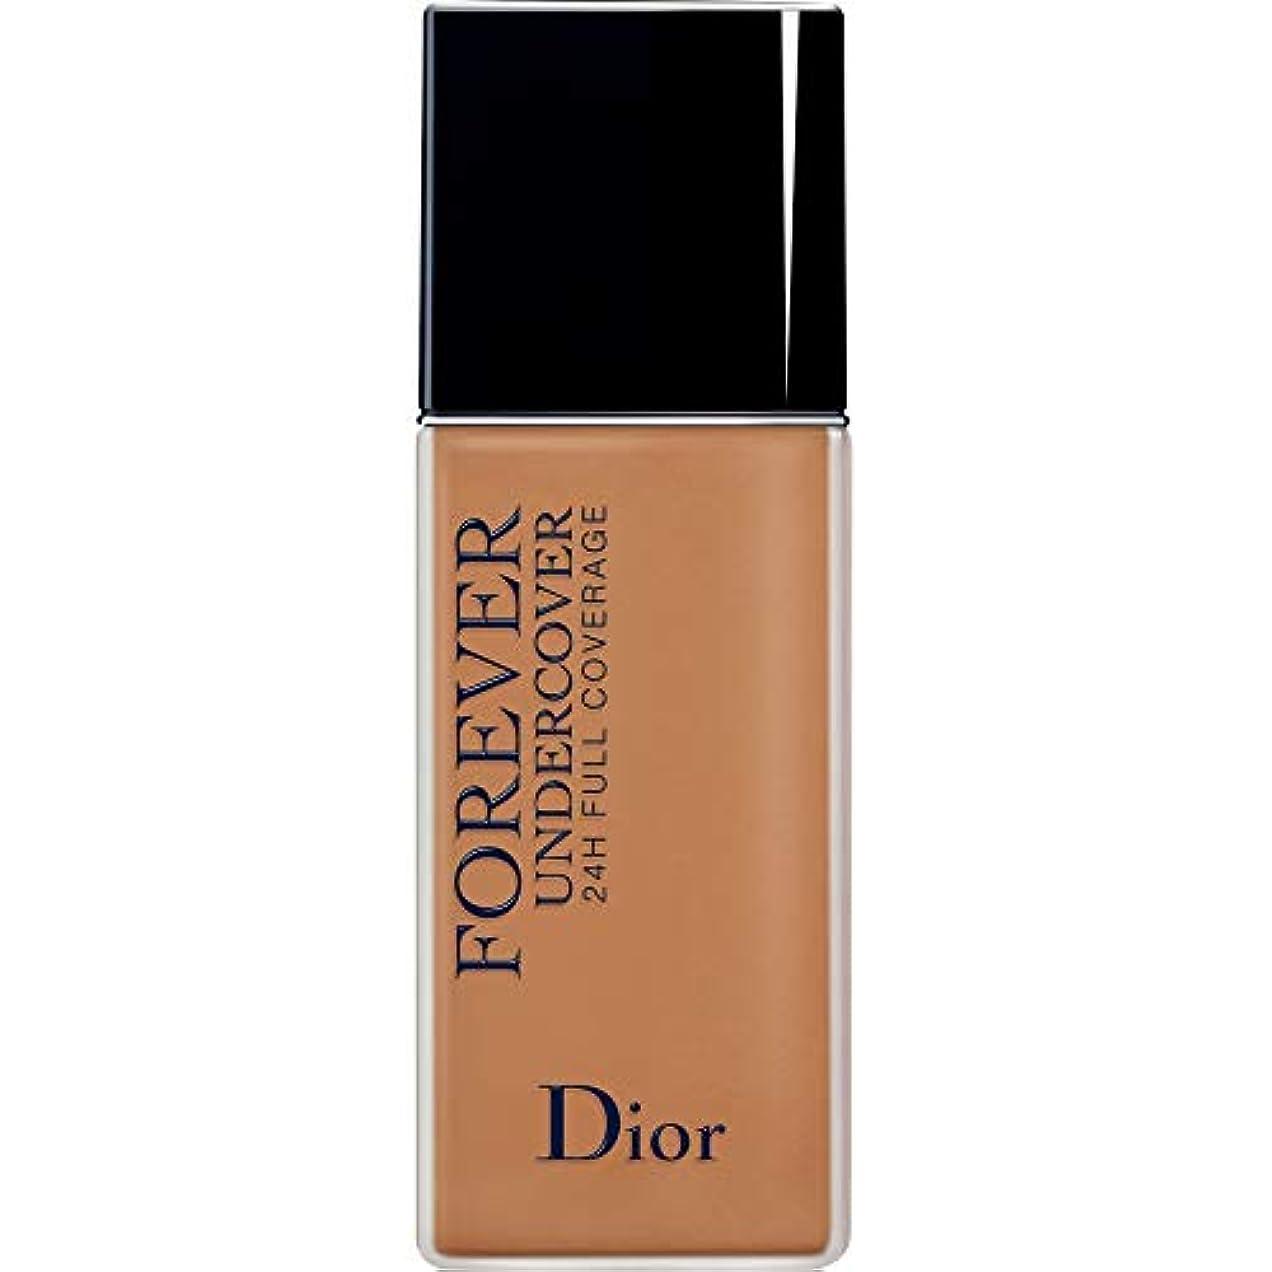 [Dior ] ディオールディオールスキン永遠アンダーカバーフルカバーの基礎40ミリリットル051 - プラリネ - DIOR Diorskin Forever Undercover Full Coverage Foundation...